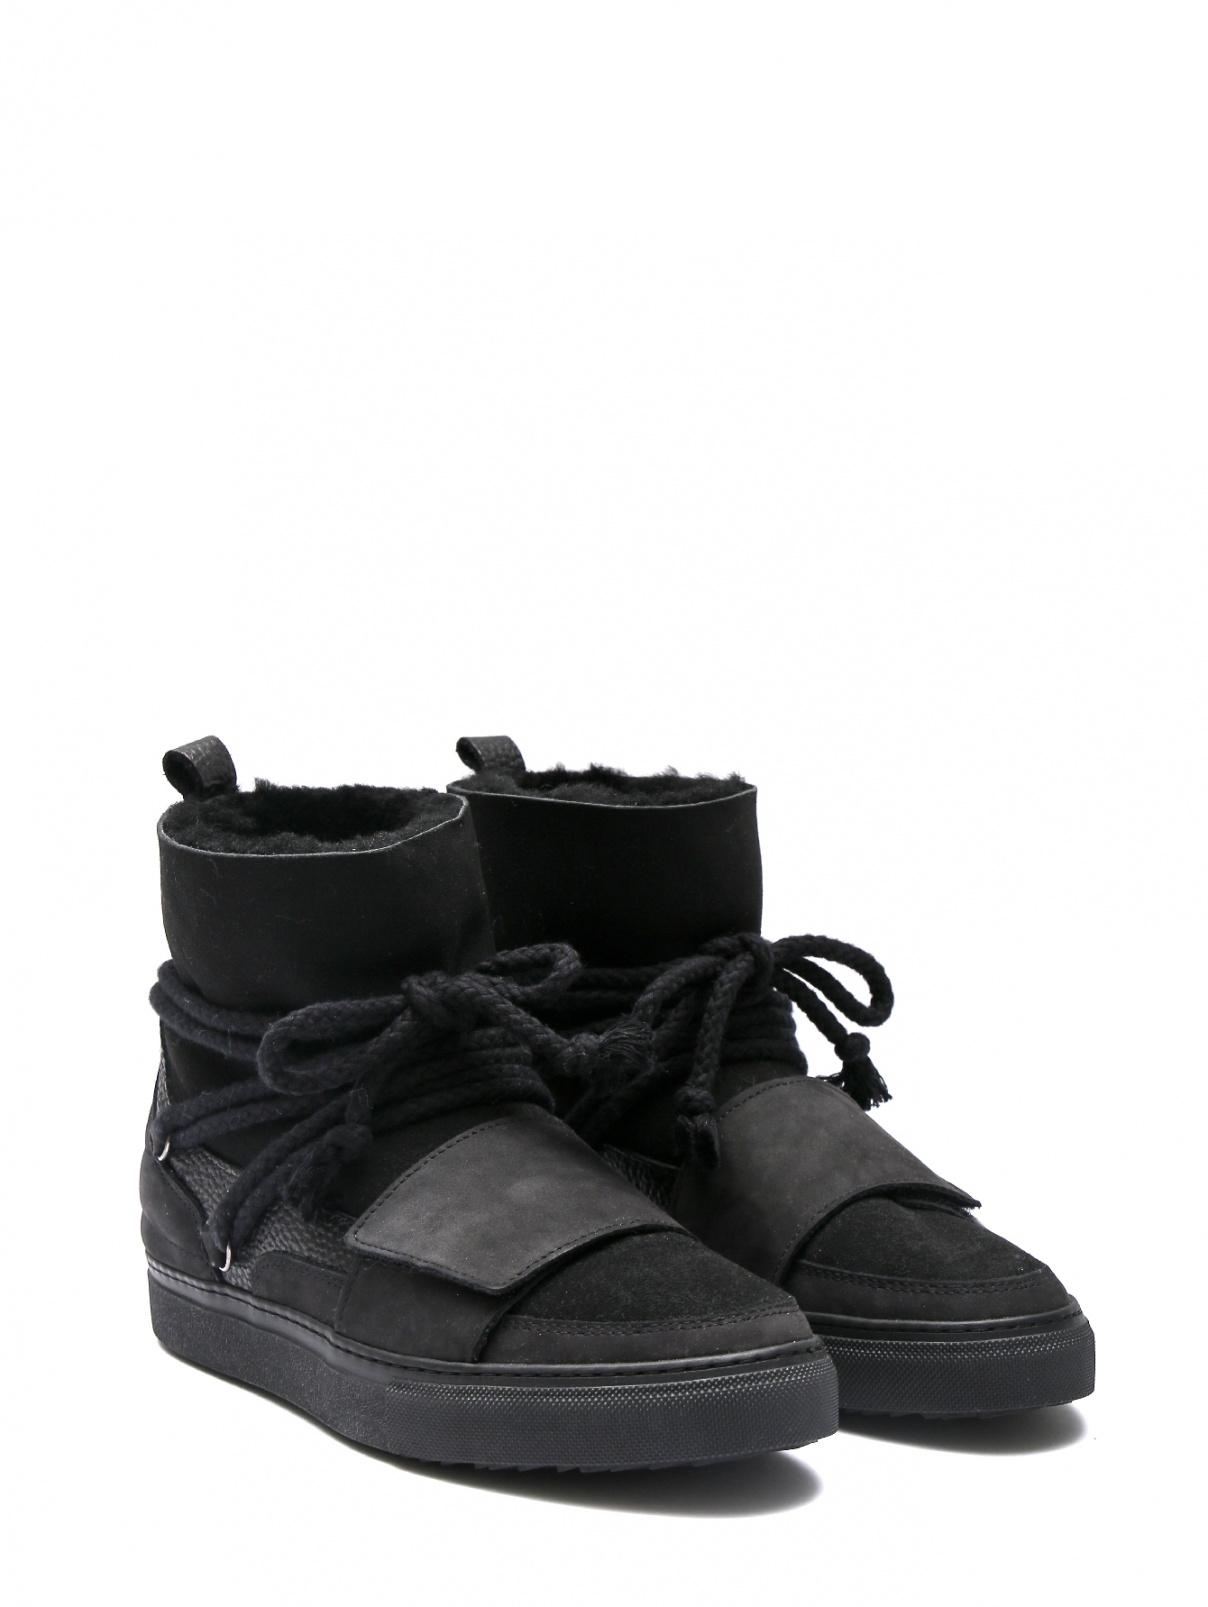 Ботинки на меху из кожи Inuikii  –  Общий вид